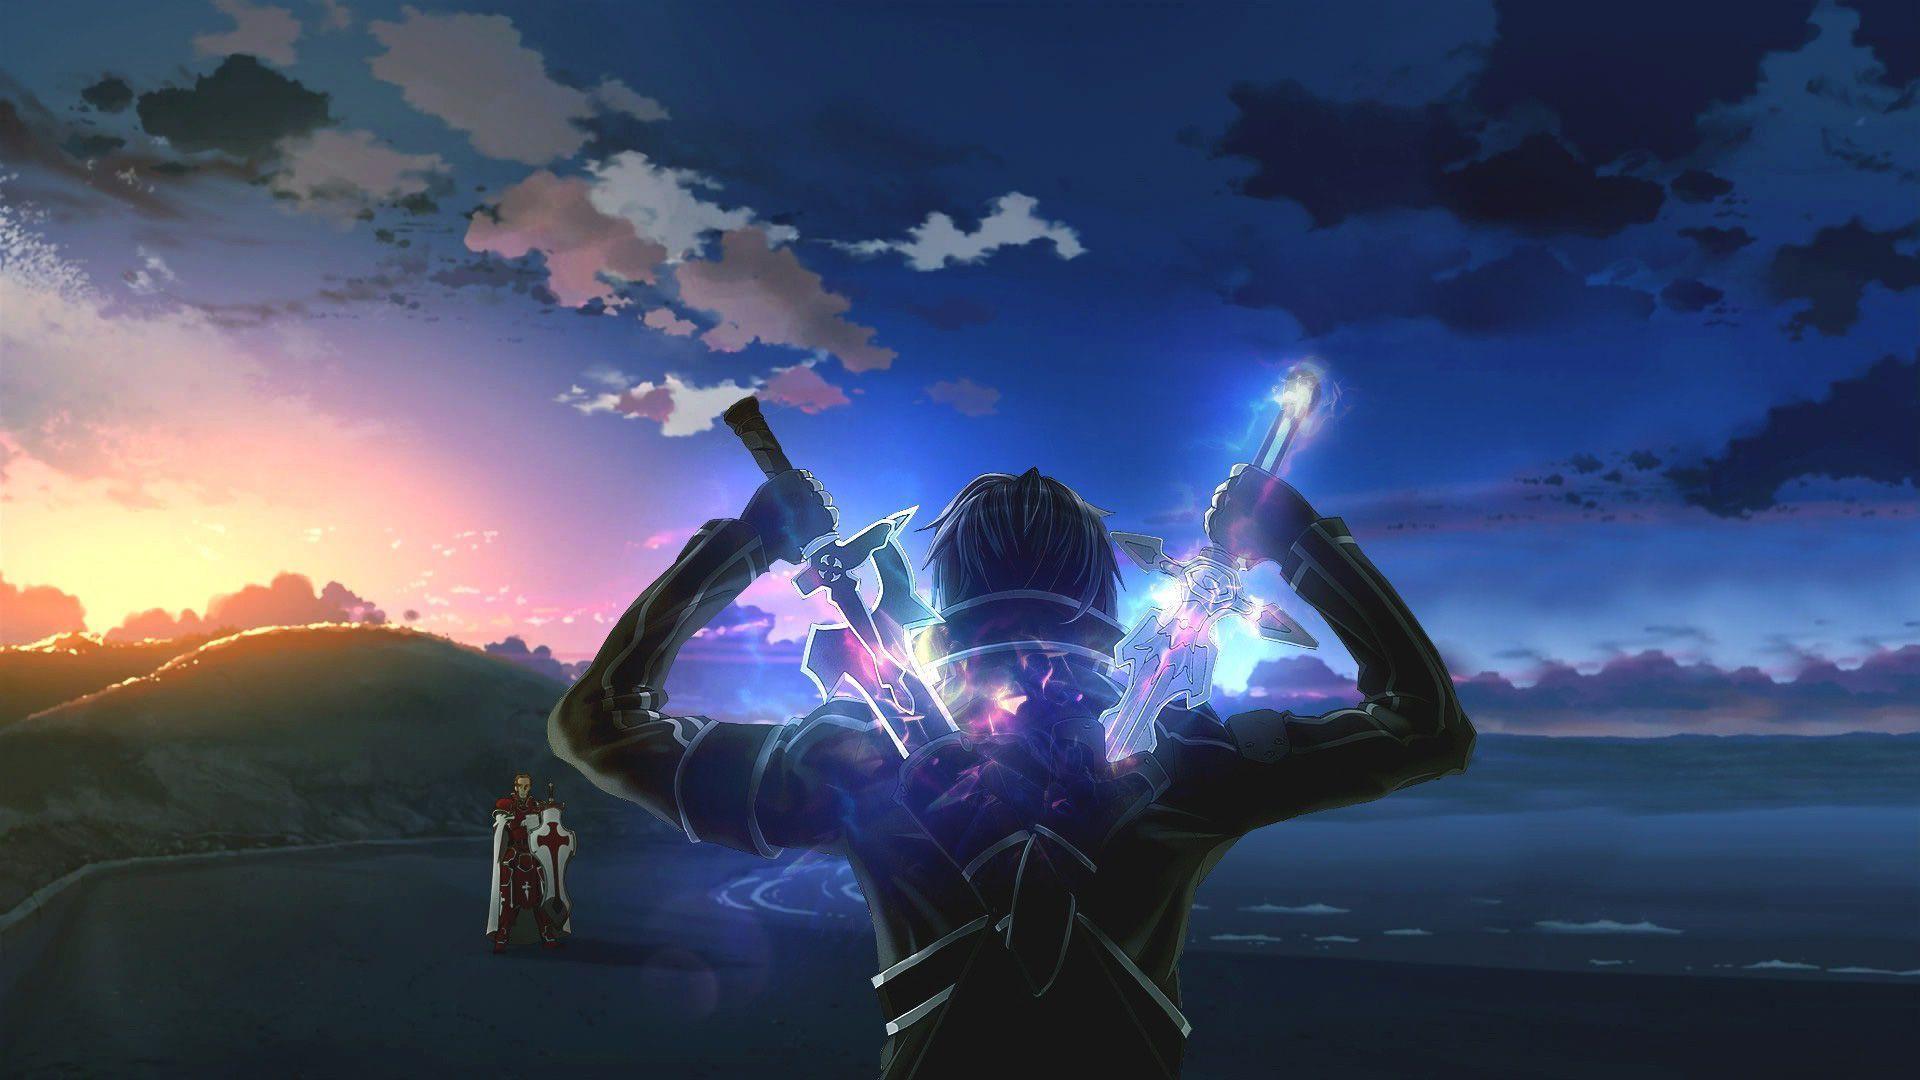 Fight Sword Art Online Anime Wallpaper Sword Art Online